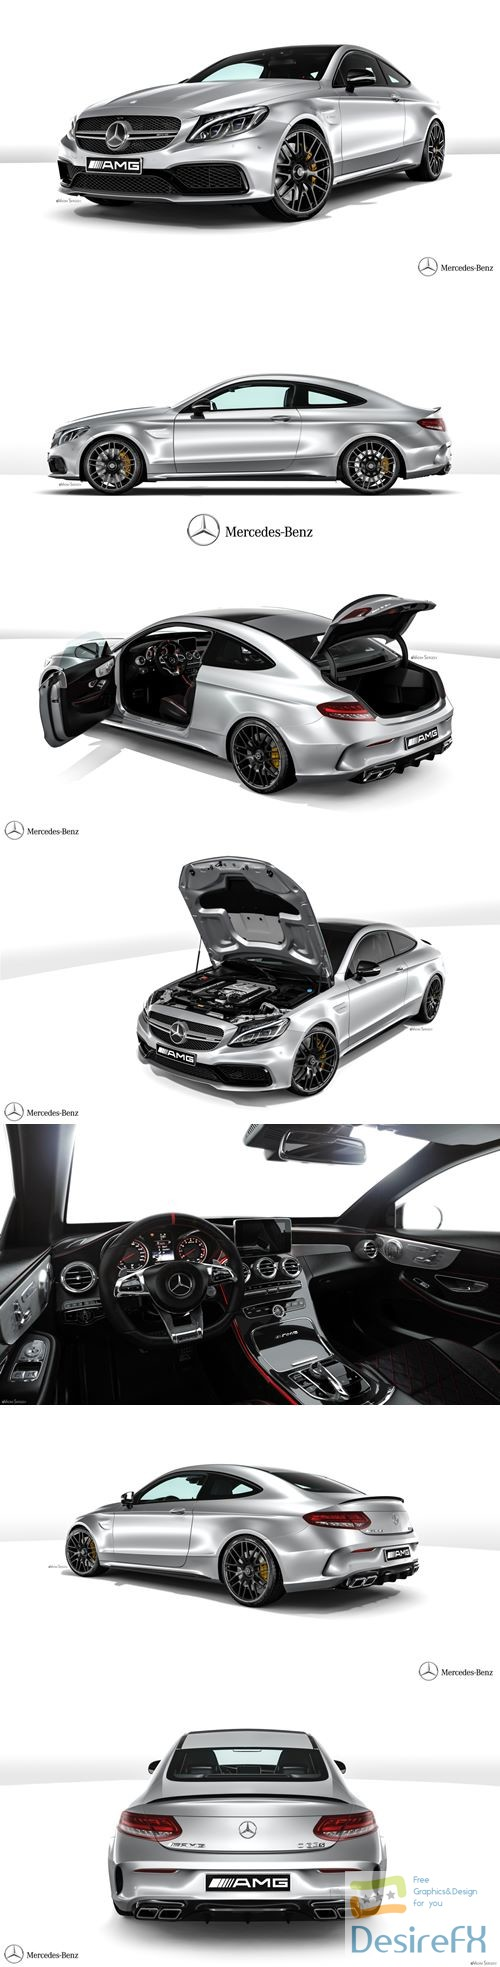 Mercedes-Benz C63 AMG Coupe 2016 3D Model